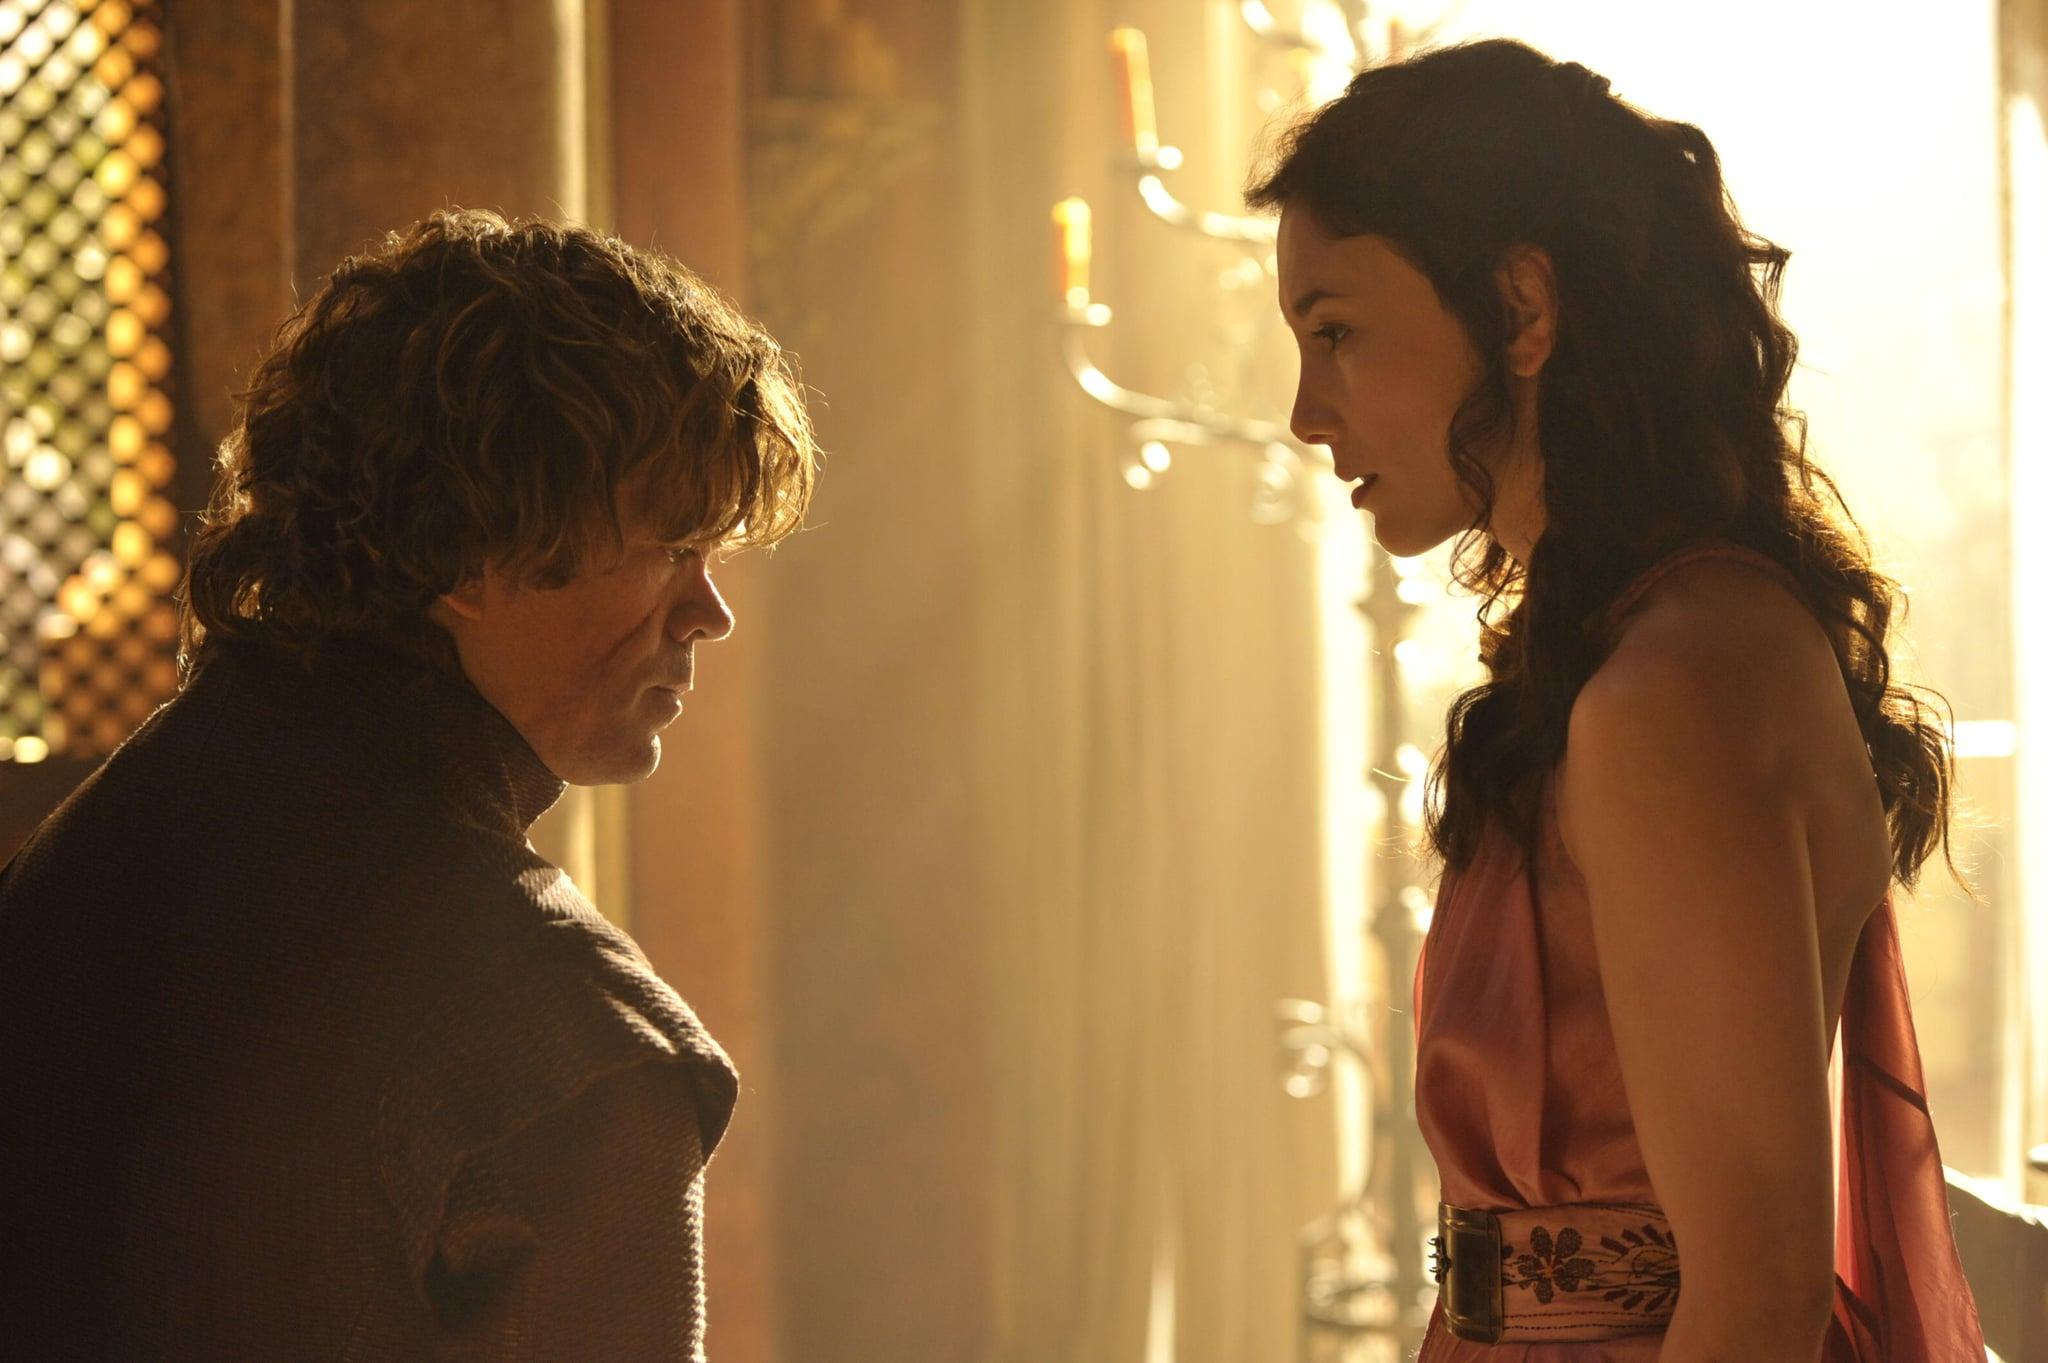 Peter Dinklage as Tyrion Lannister and Sibel Kekilli as Shae.